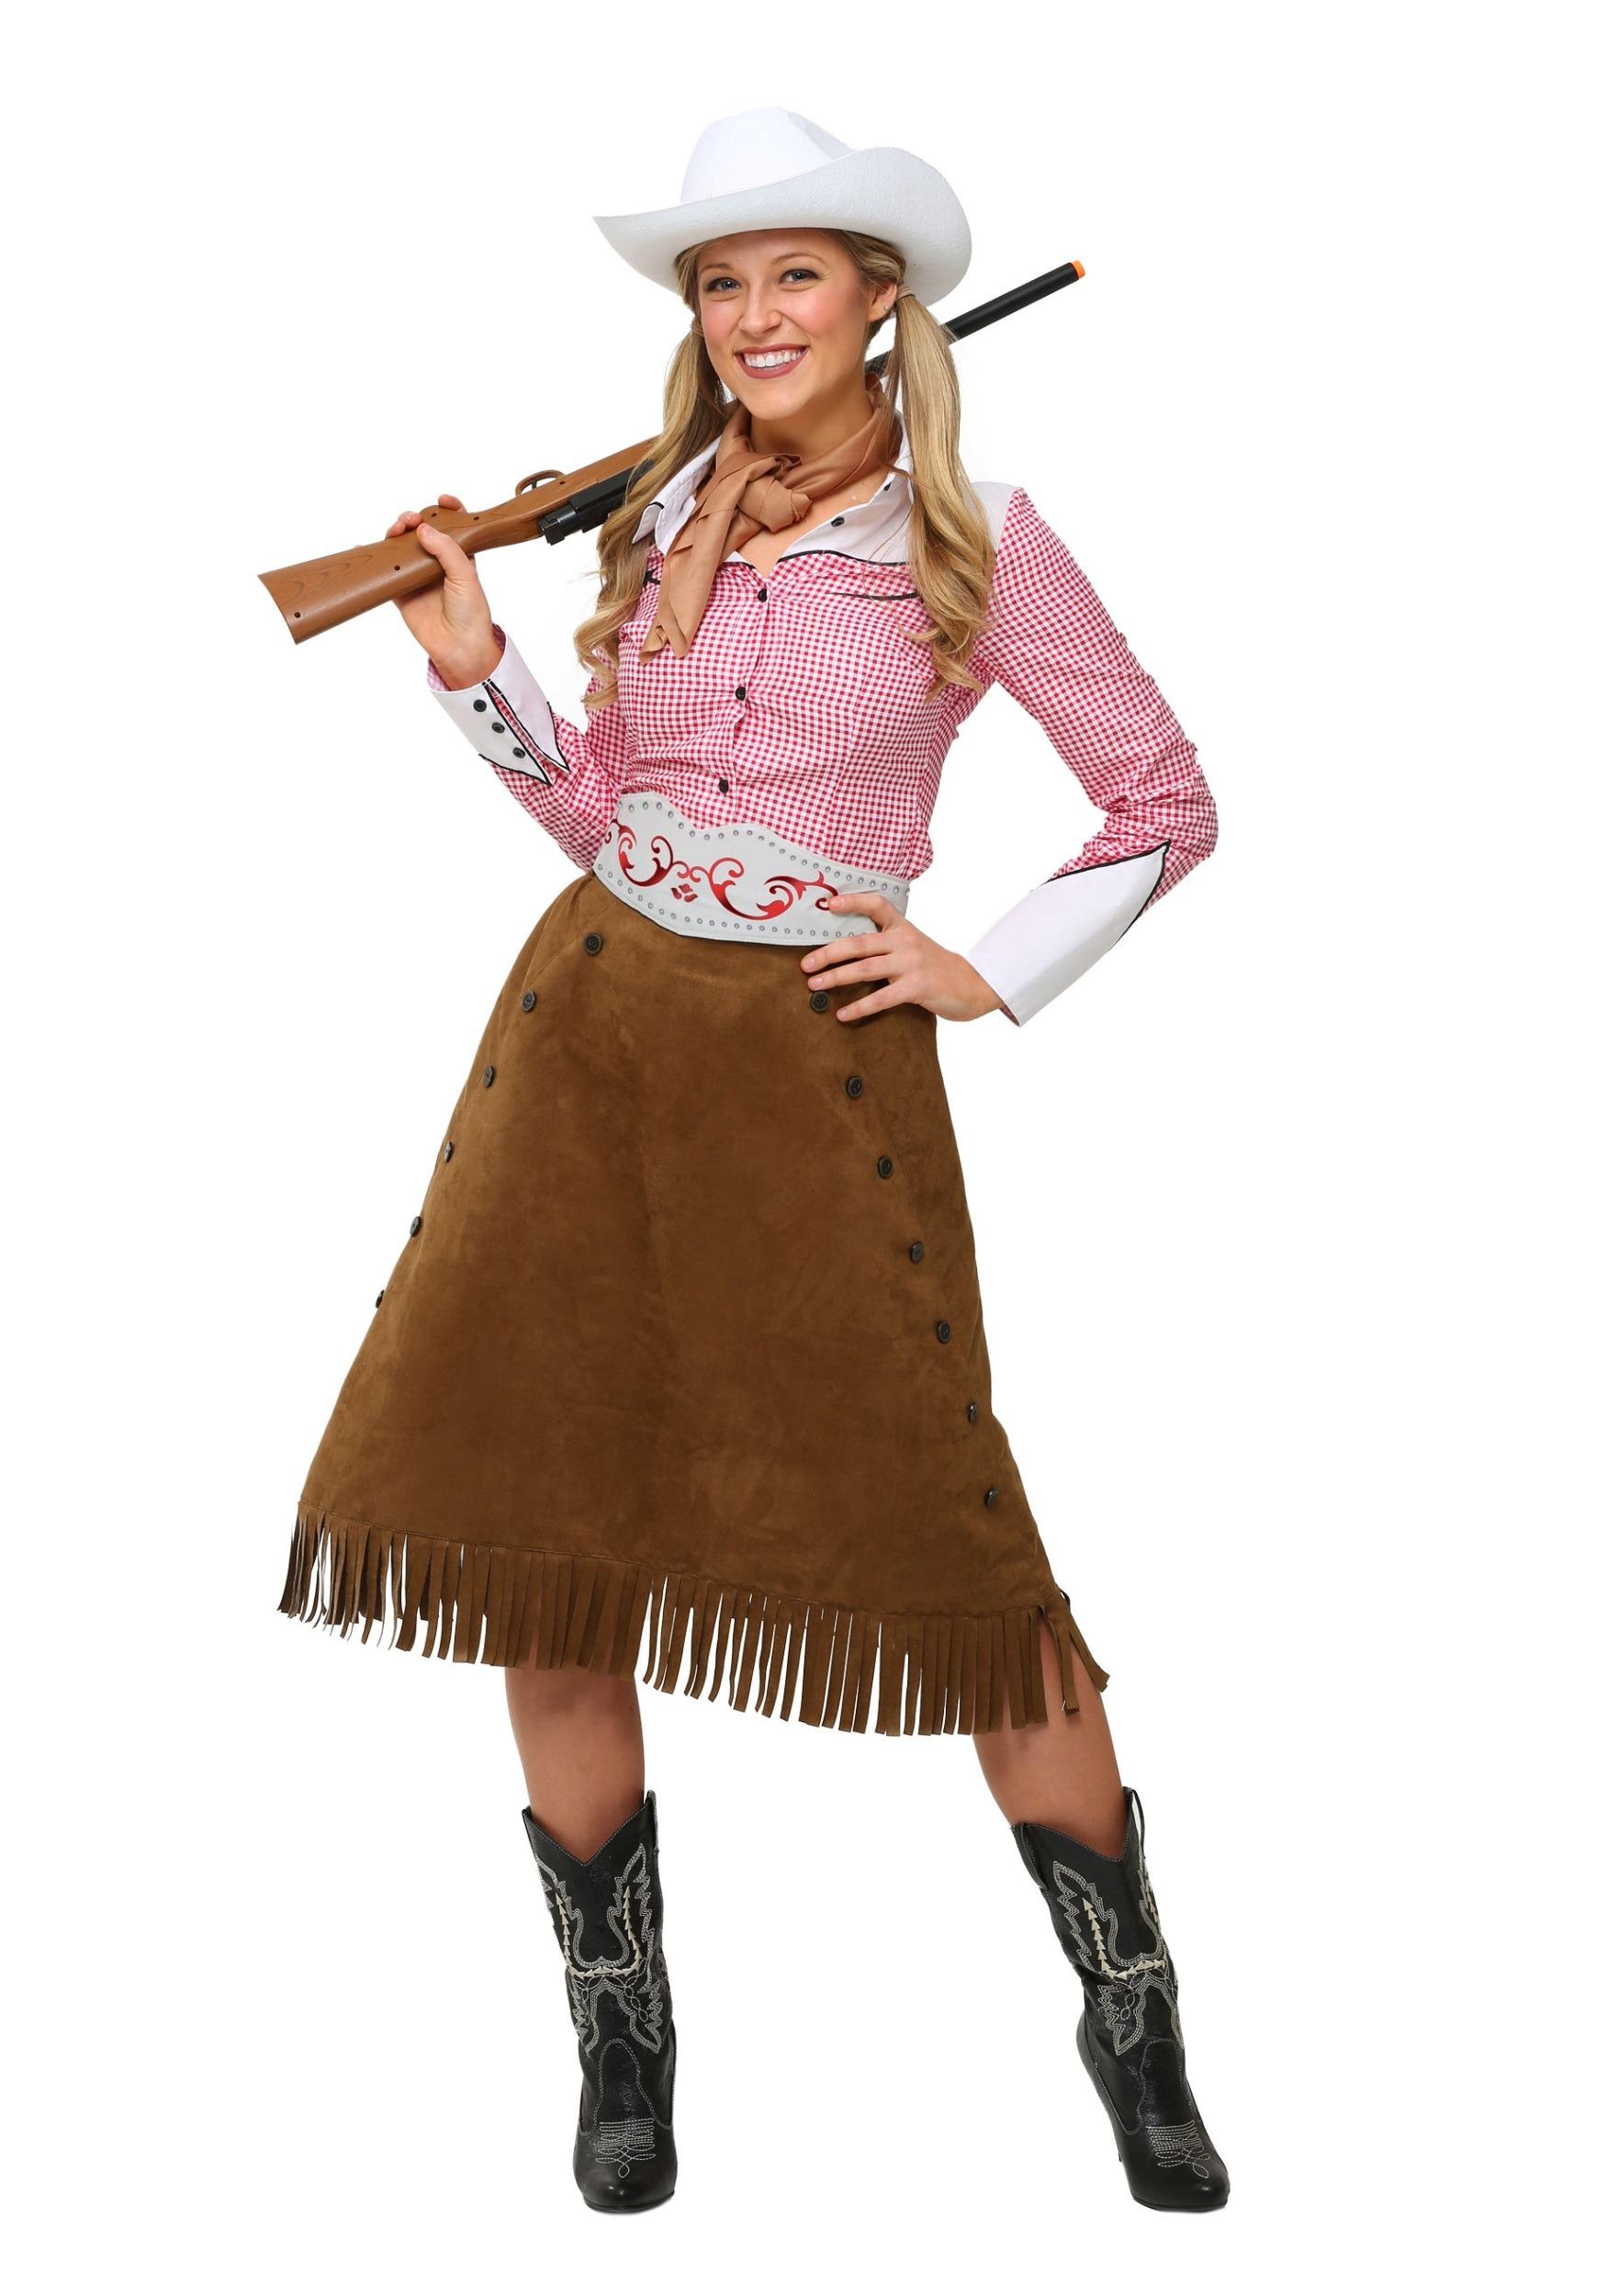 Cowgirl  sc 1 st  Jooinn & Free photo: Cowgirl - Hat Human Girl - Free Download - Jooinn